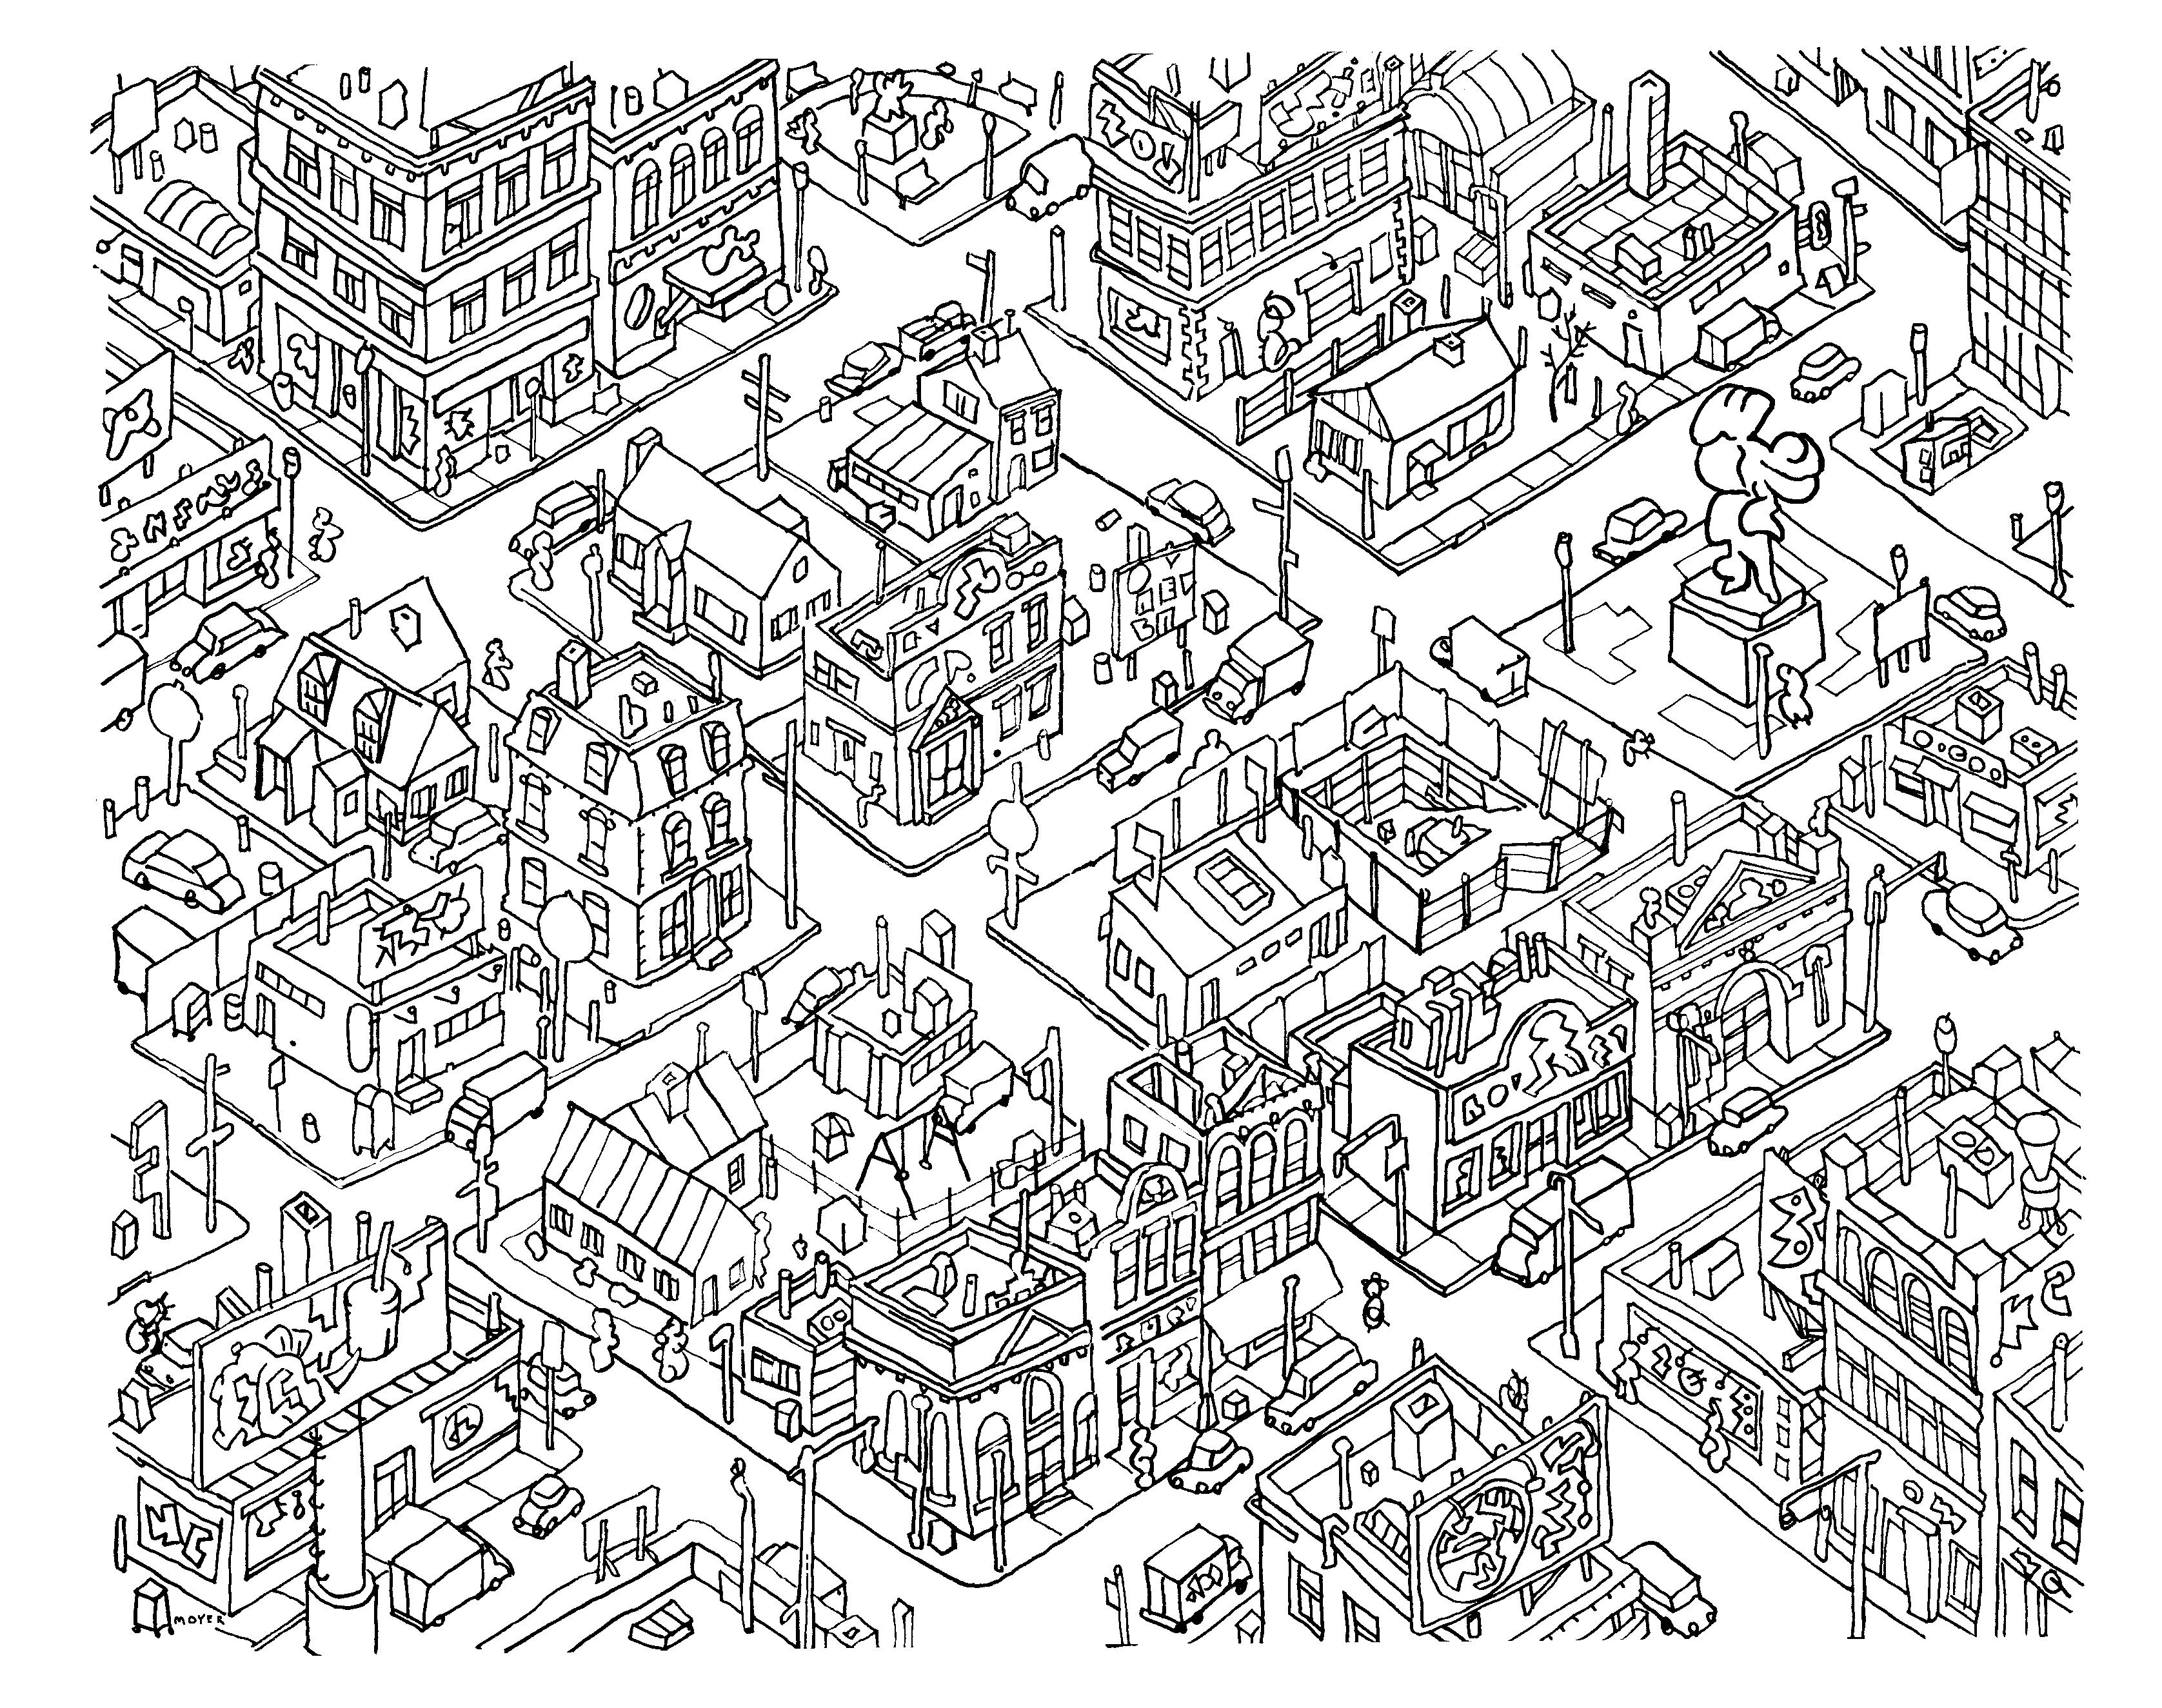 doodle art coloring pages - Doodle Coloring Pages